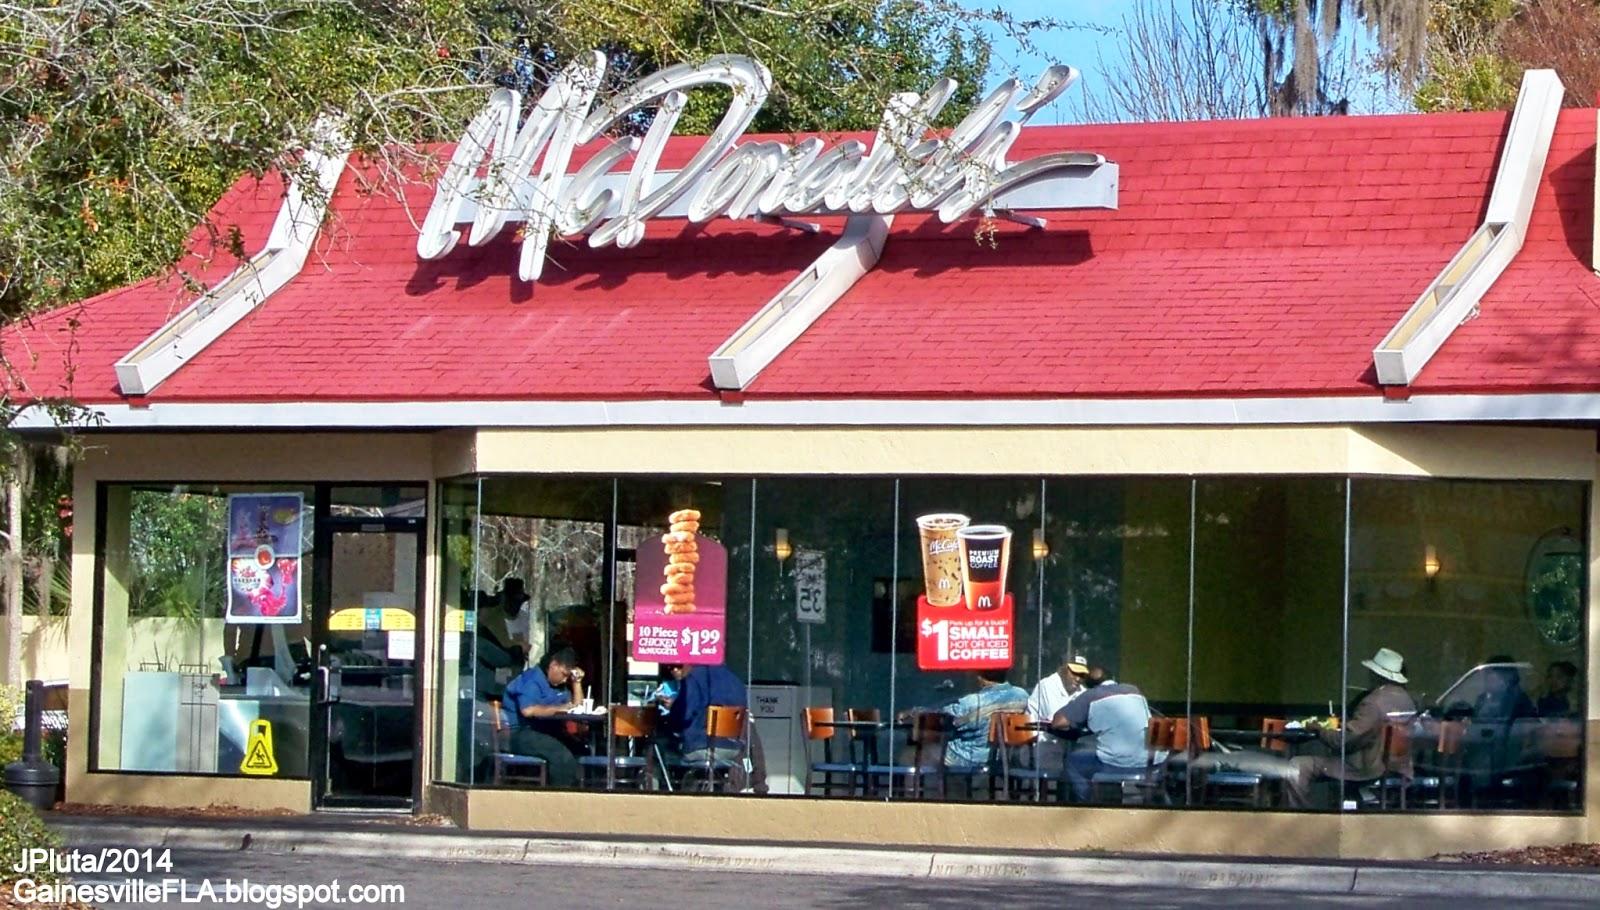 Mcdonald S Gainesville Florida Nw 13th Street Side Entrance Fast Food Hamburger Restaurant Alachua County Fl